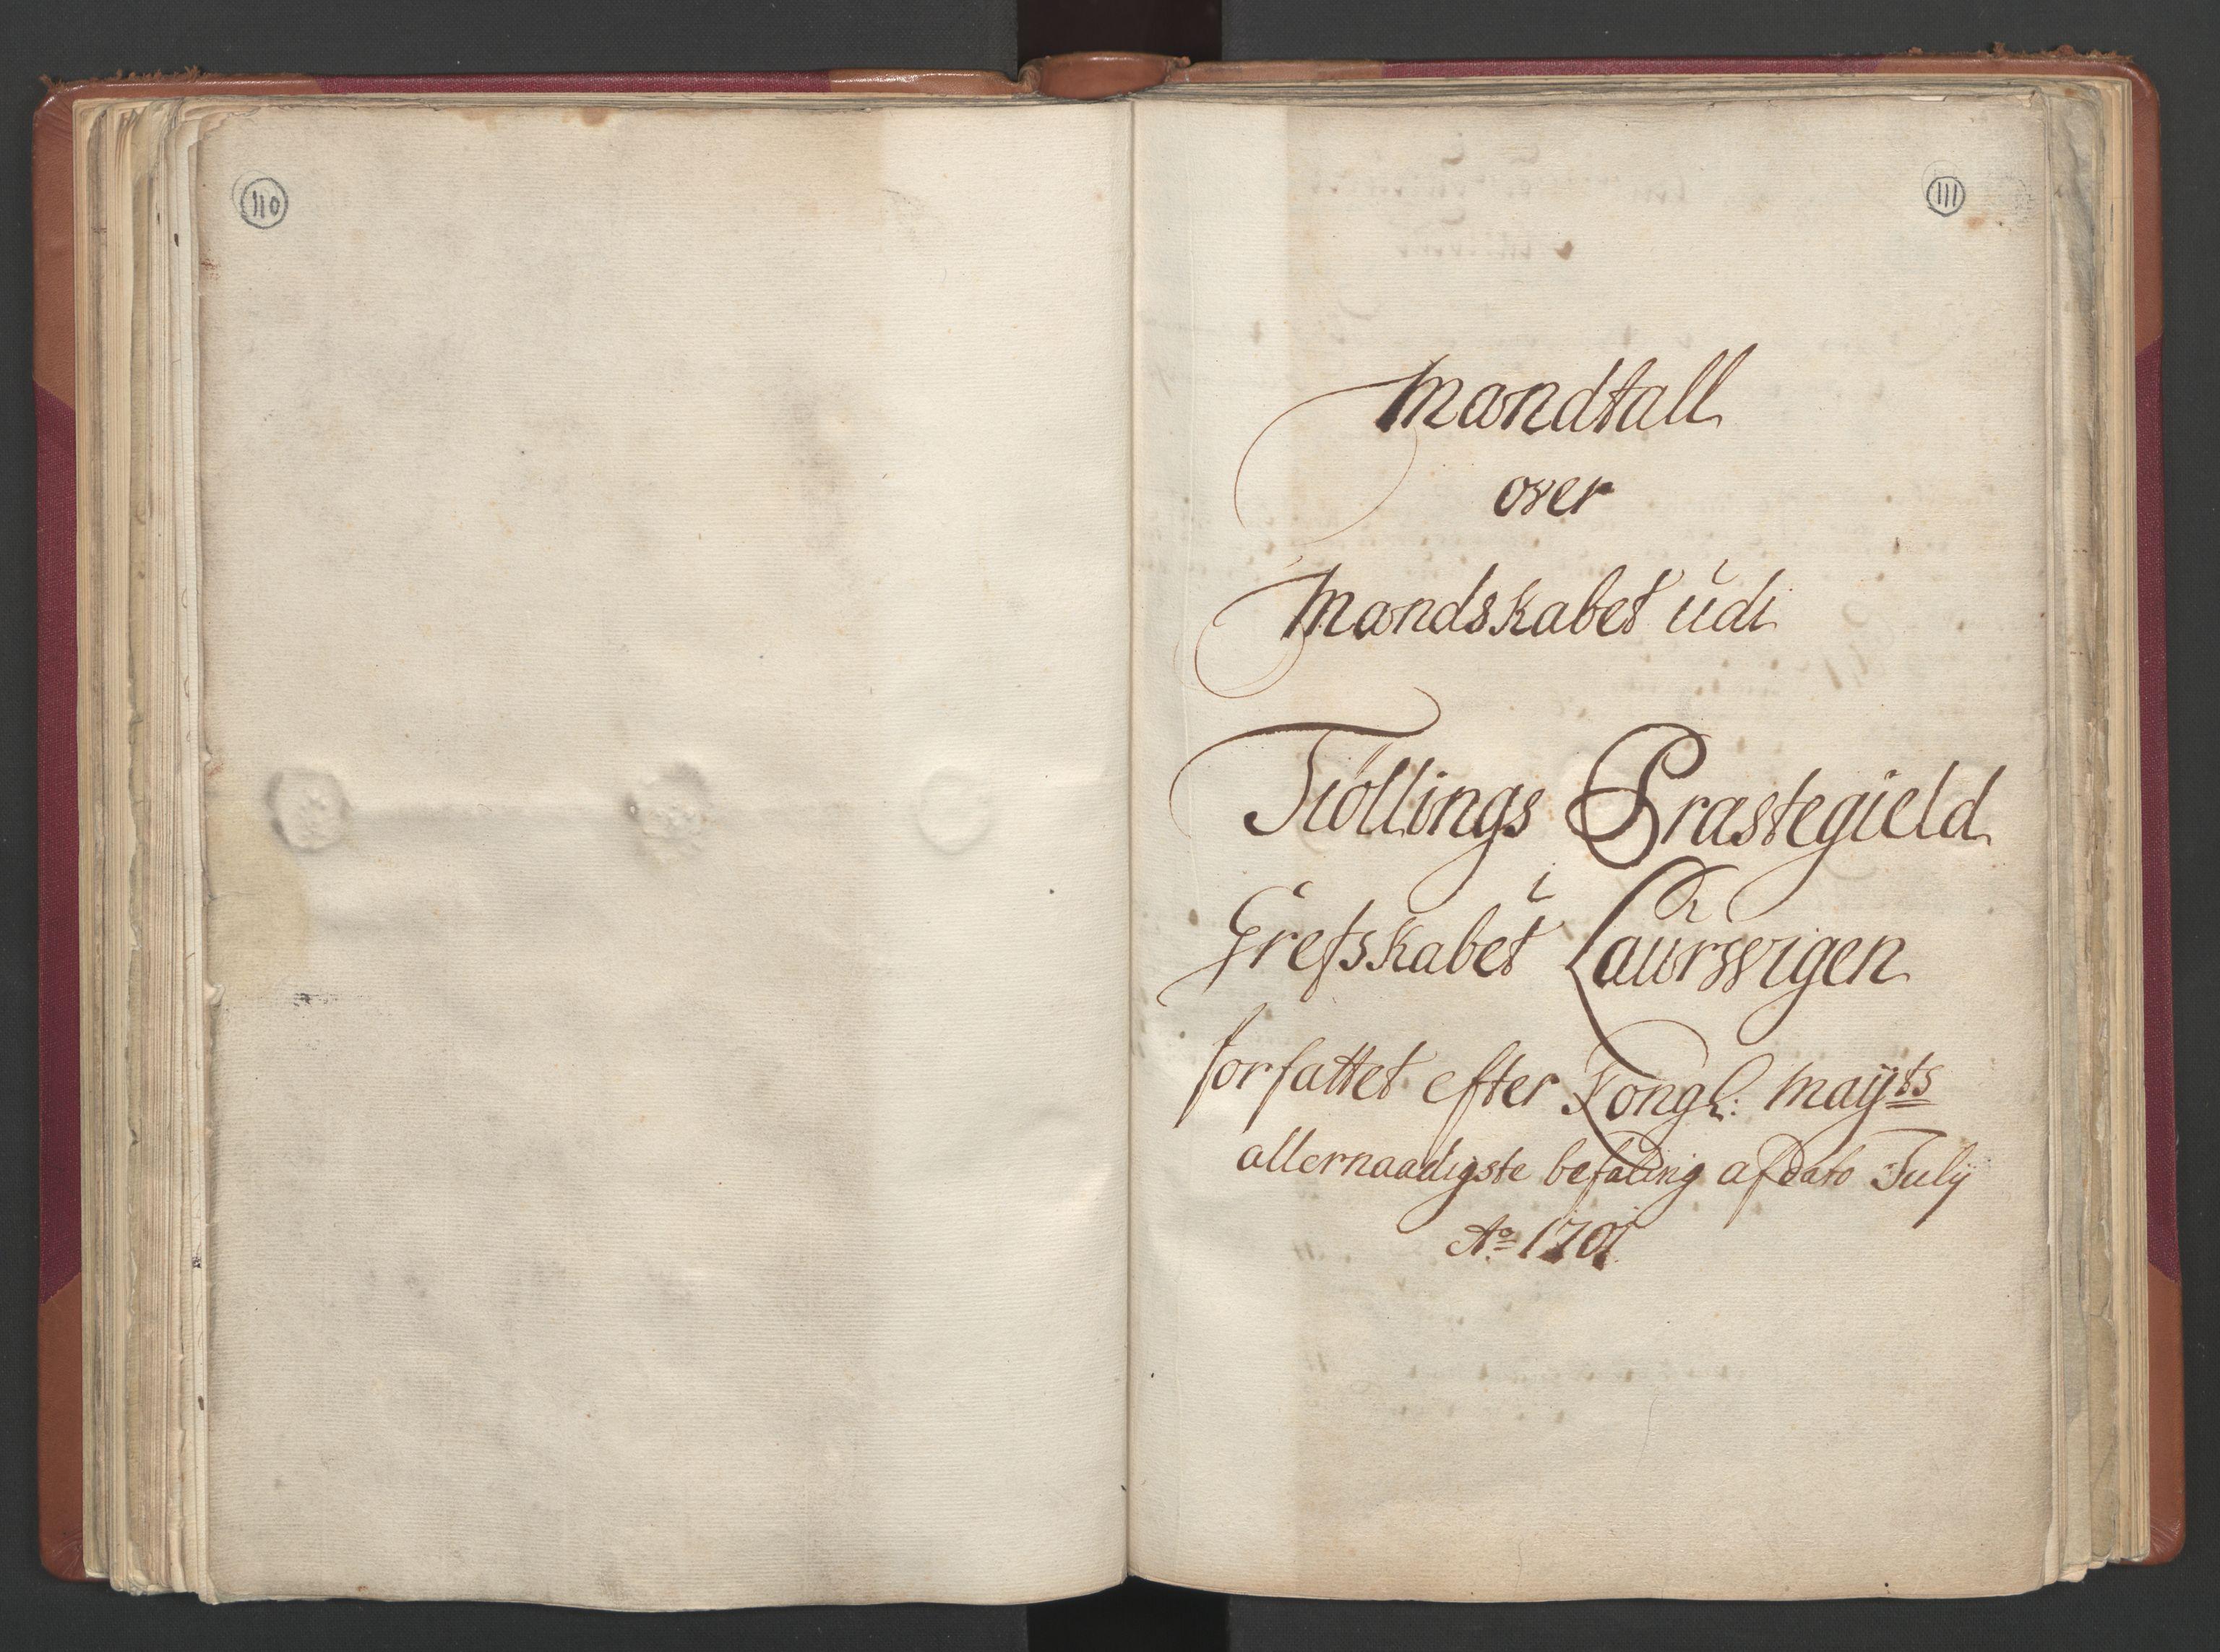 RA, Manntallet 1701, nr. 2: Solør, Odal og Østerdal fogderi og Larvik grevskap, 1701, s. 110-111